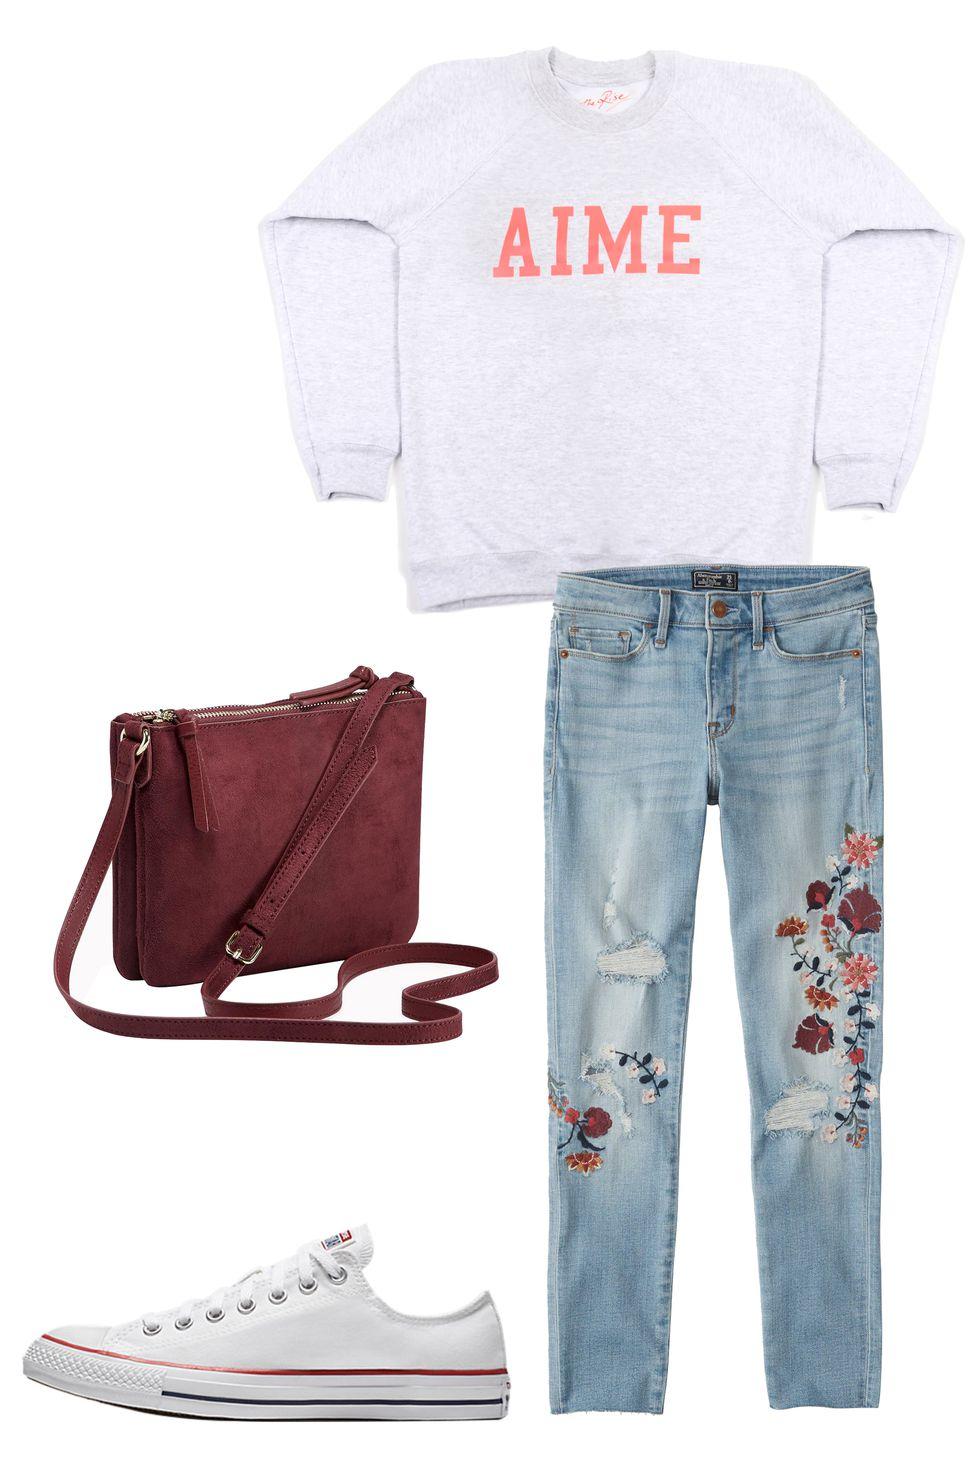 blue-light-skinny-jeans-burgundy-bag-grayl-sweater-sweatshirt-white-shoe-sneakers-converse-howtowear-valentinesday-outfit-fall-winter-weekend.jpg